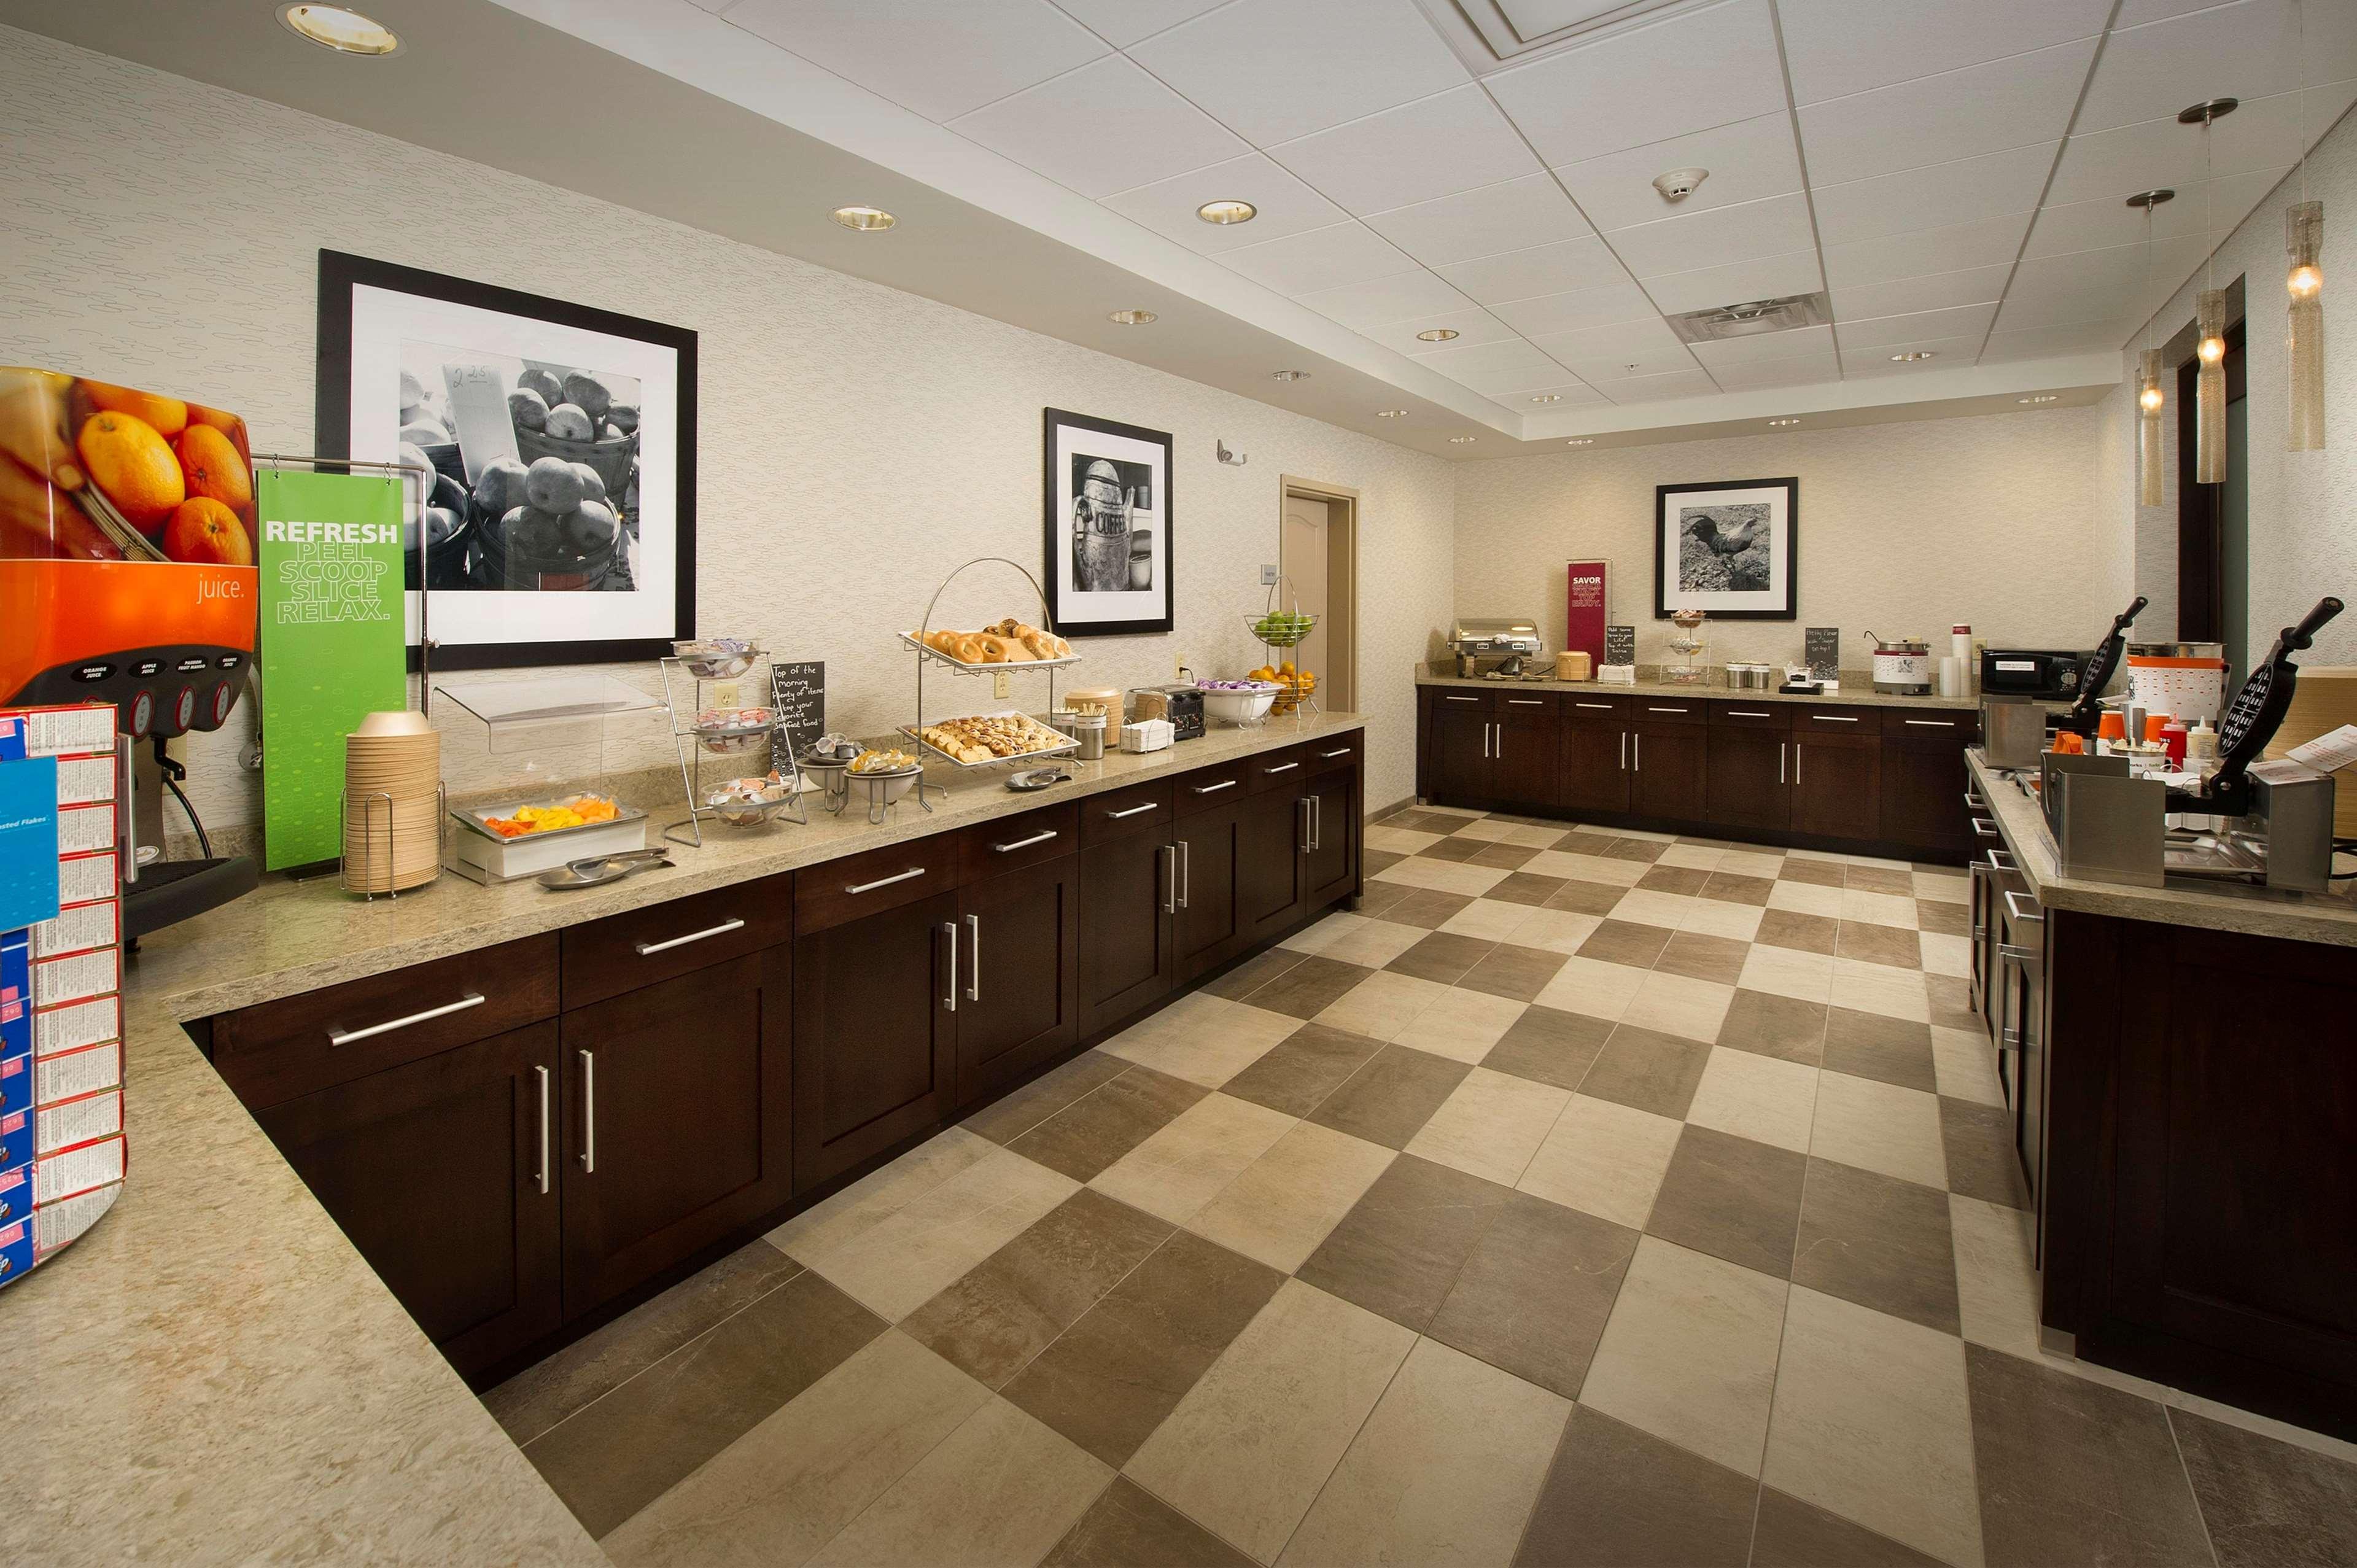 Hampton Inn & Suites Syracuse/Carrier Circle image 22